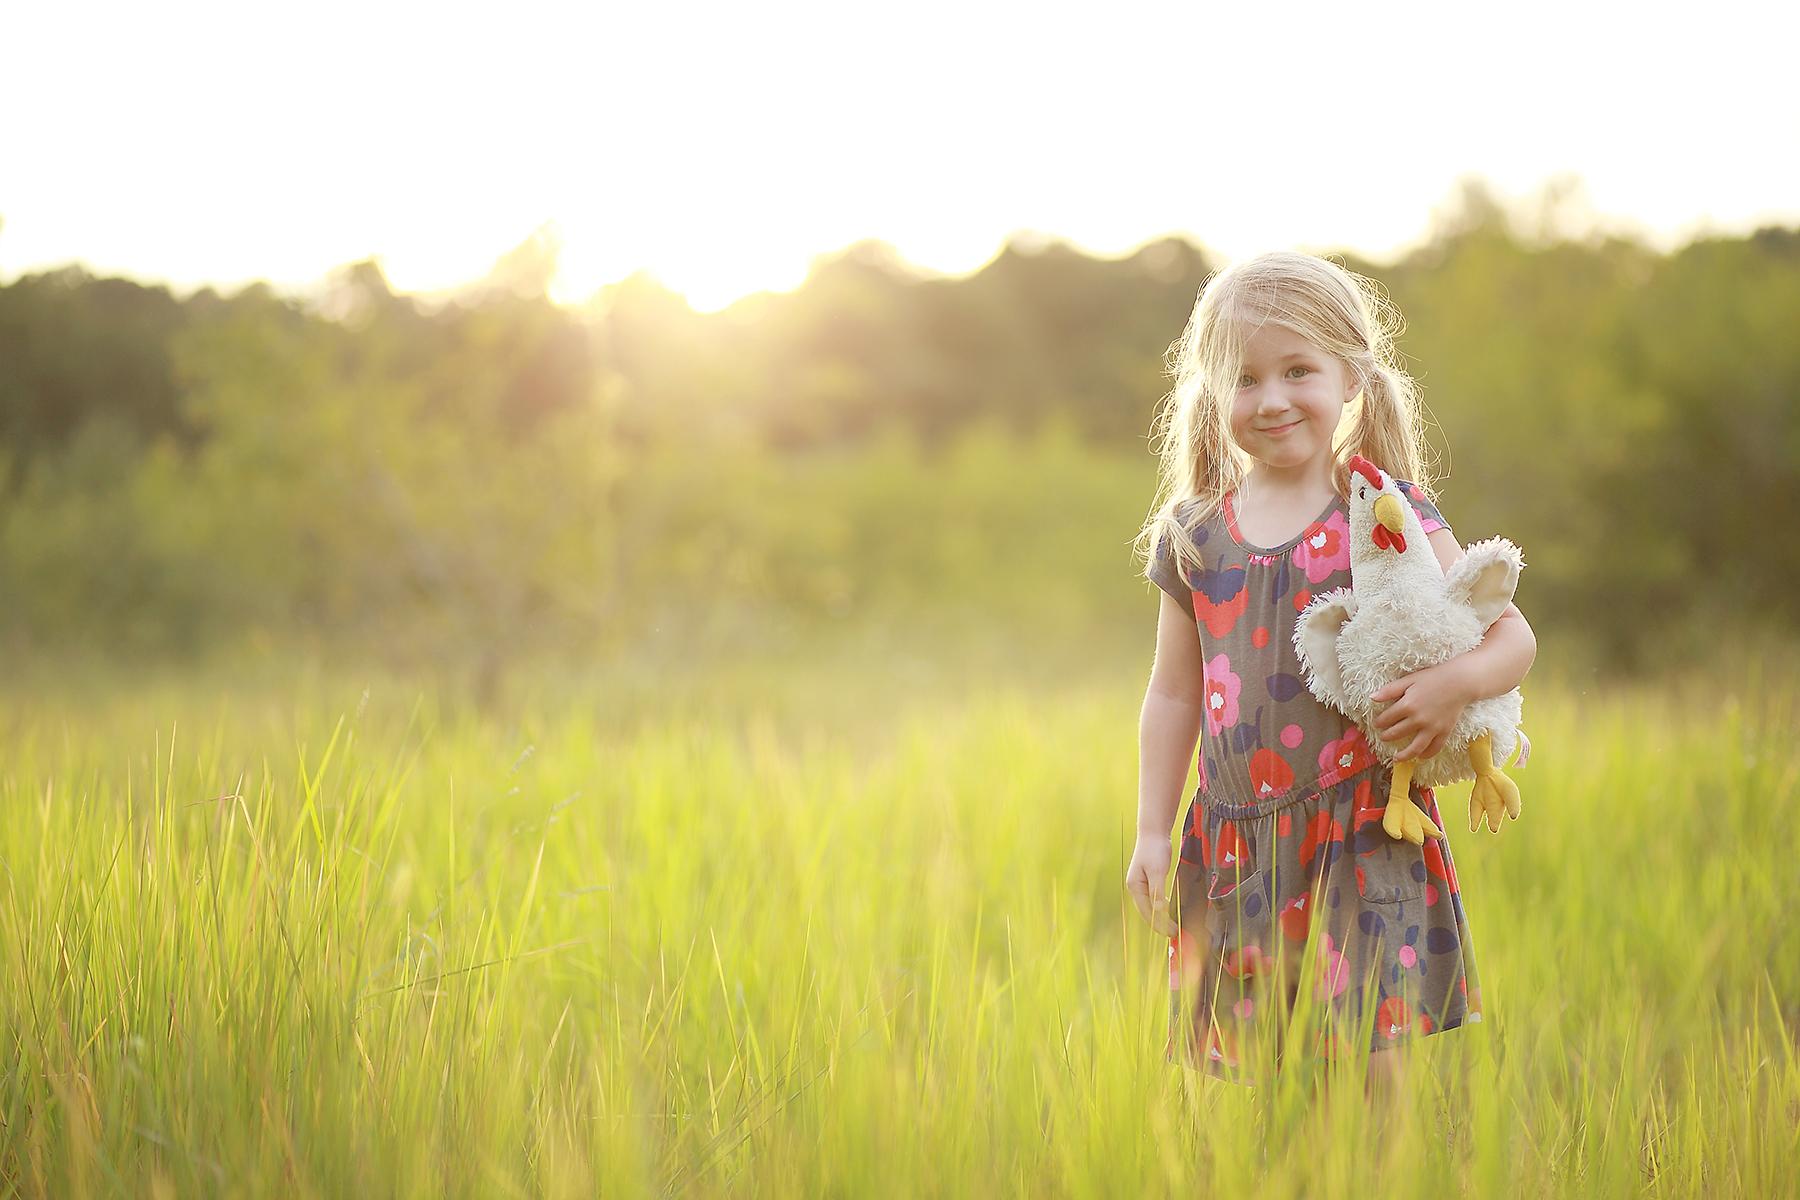 girl holding a stuffed chicken toy by Liz Behm